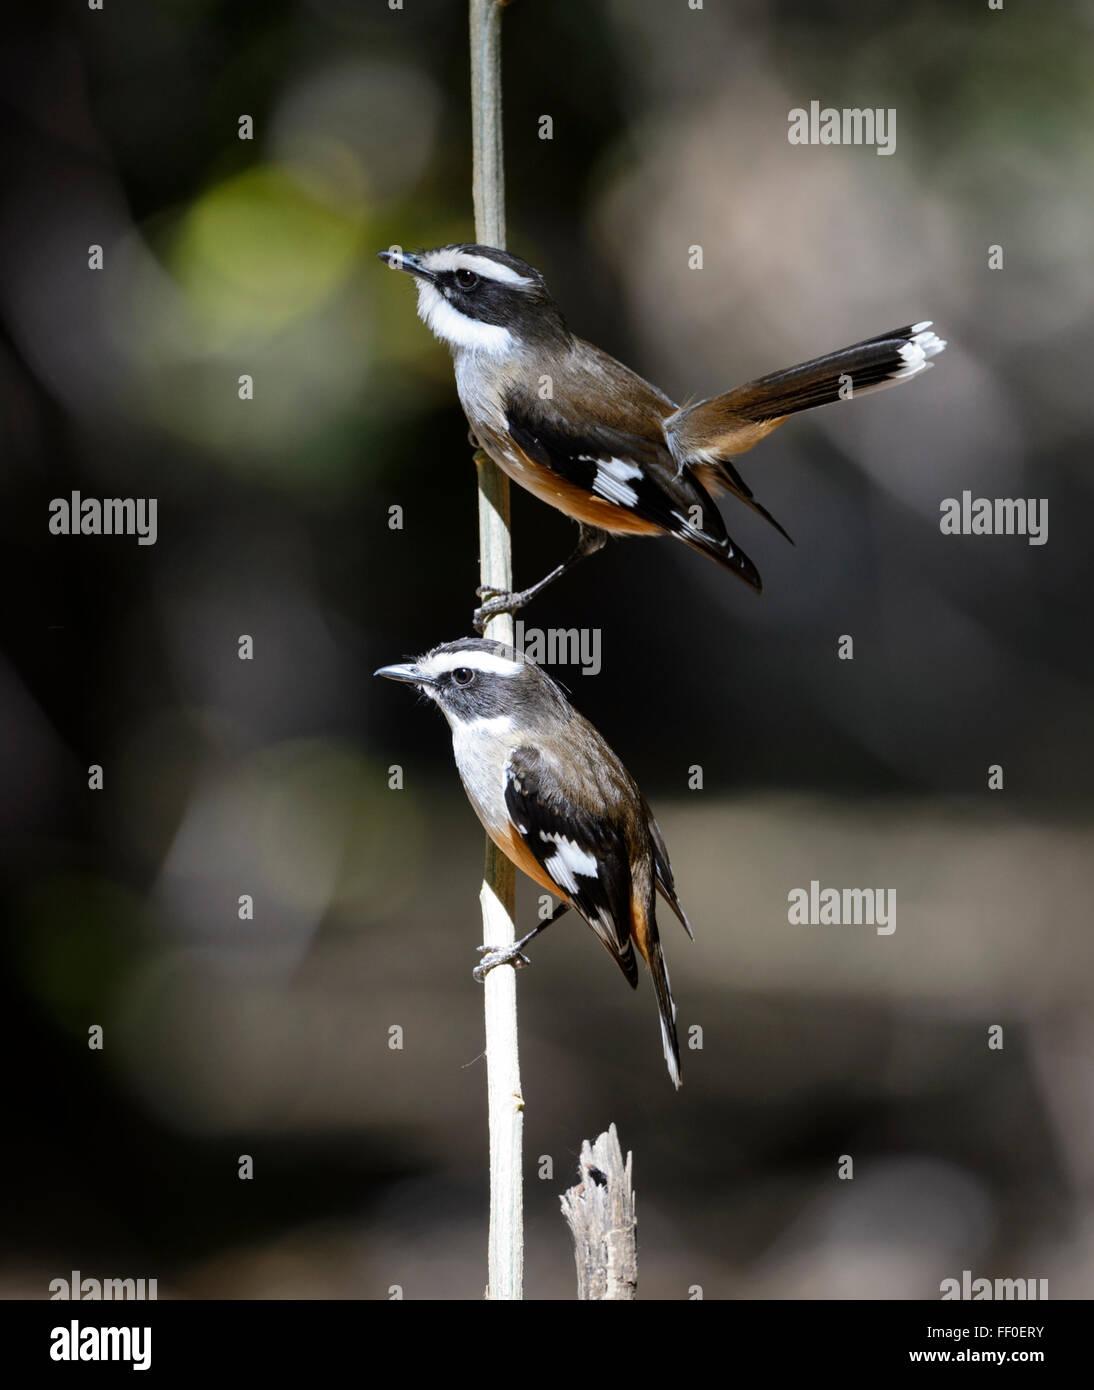 White-browed Robins (Poecilodryas superciliosa), Lawn Hill, Queensland, Australia - Stock Image